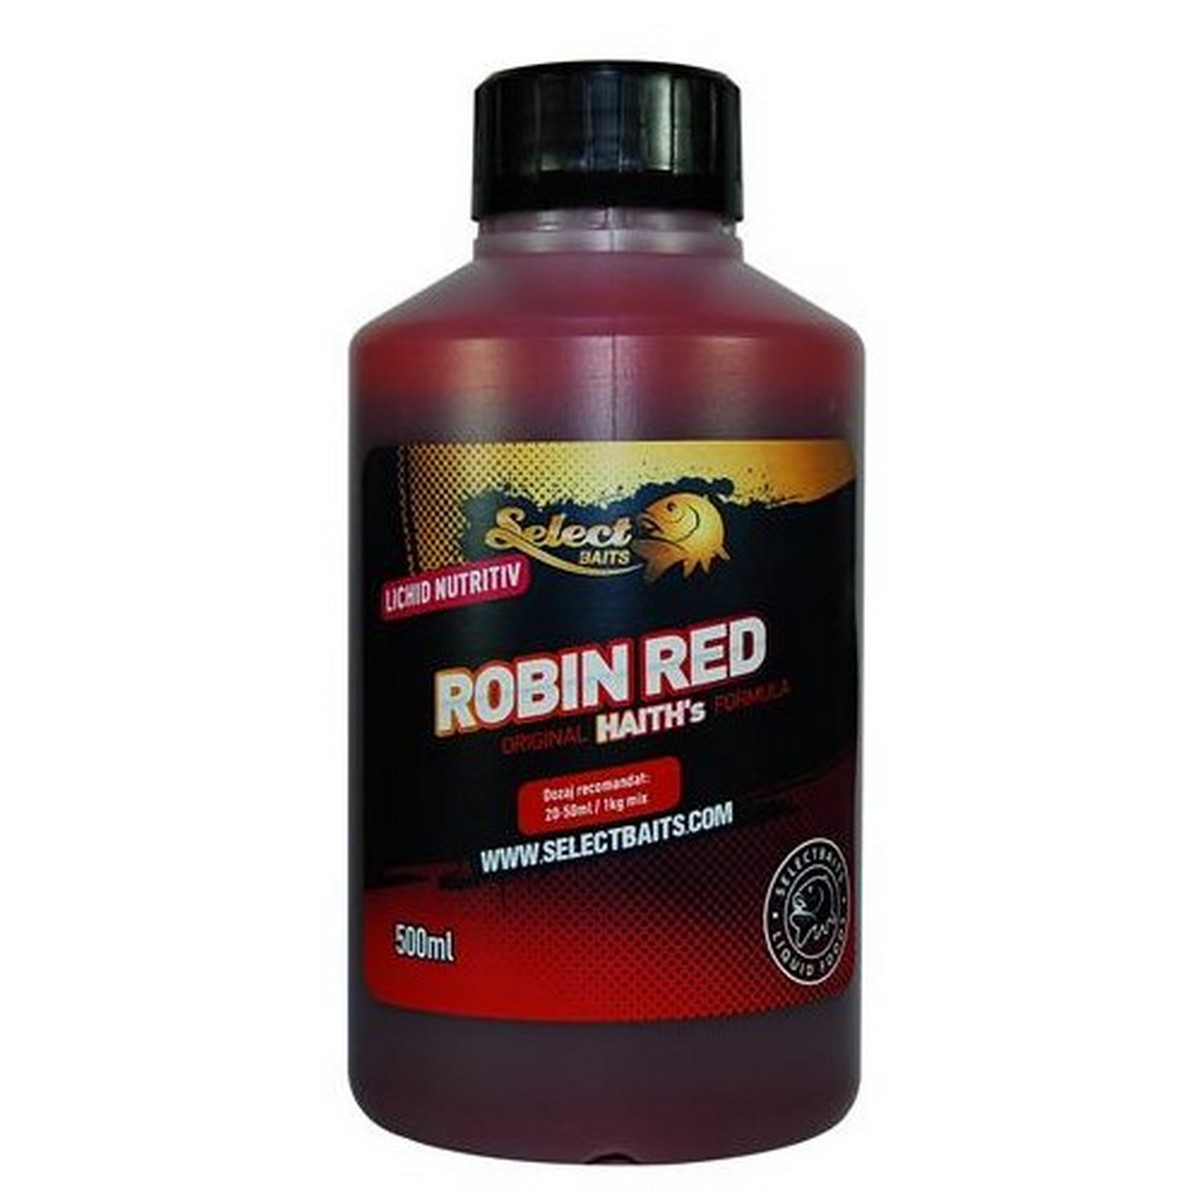 Течна добавка Robin Red Original Haith's Select Baits 500ml